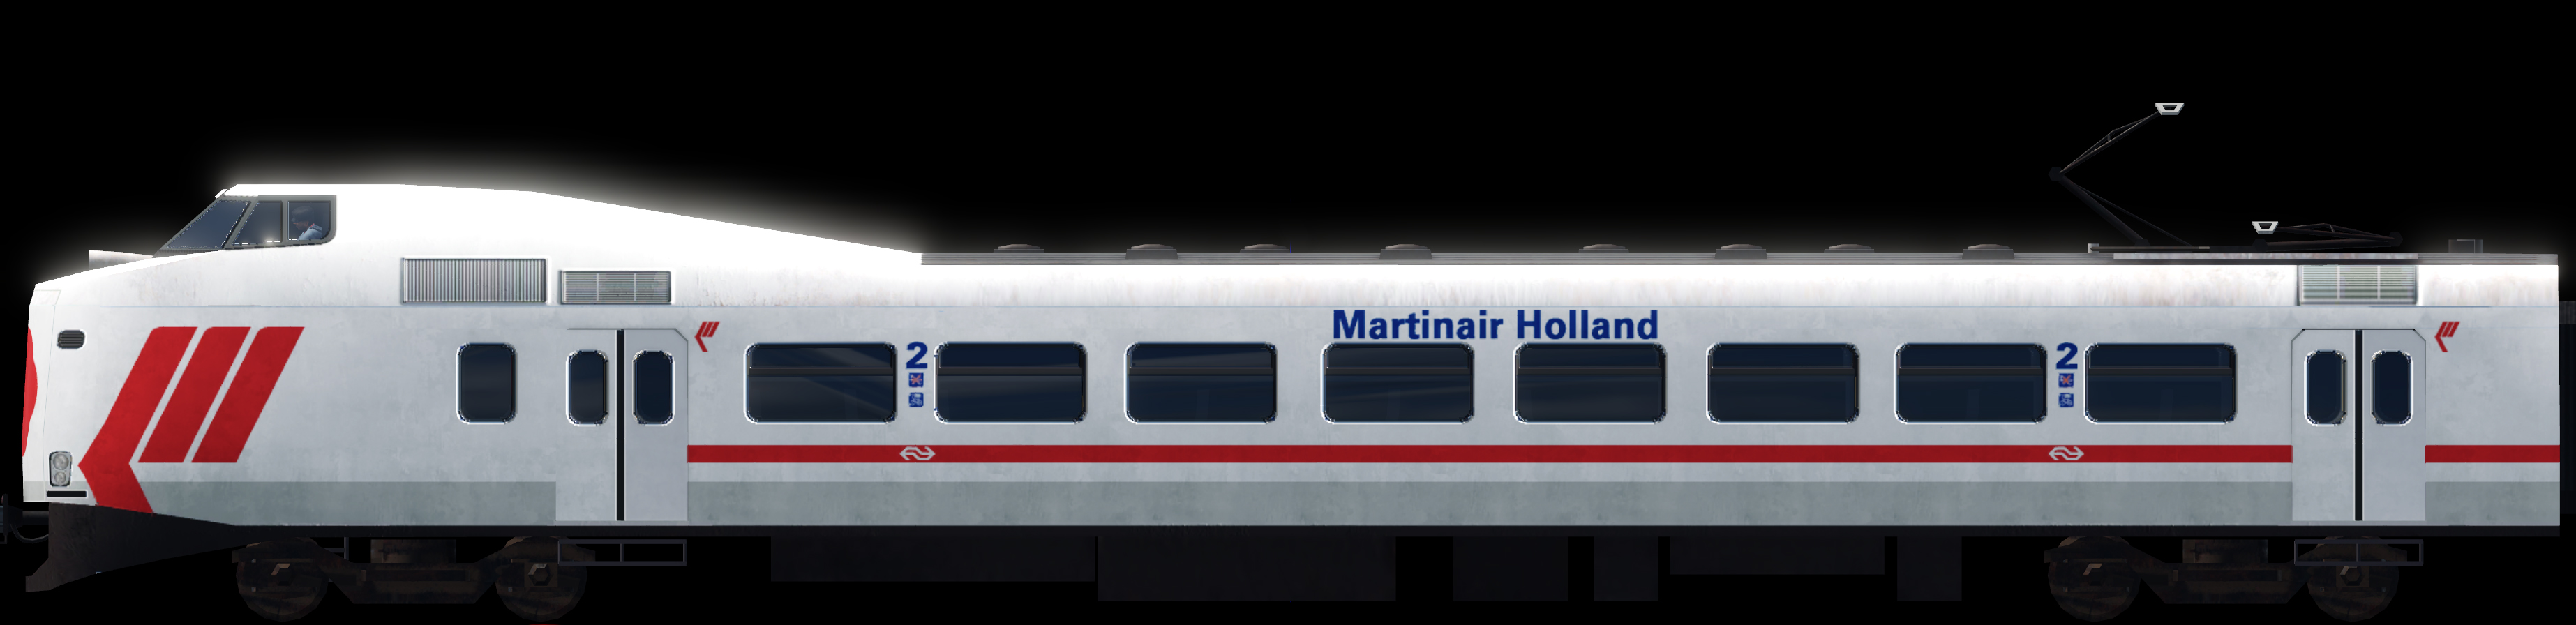 Transport Fever 2 - NS ICM Koploper: Martinair Holland